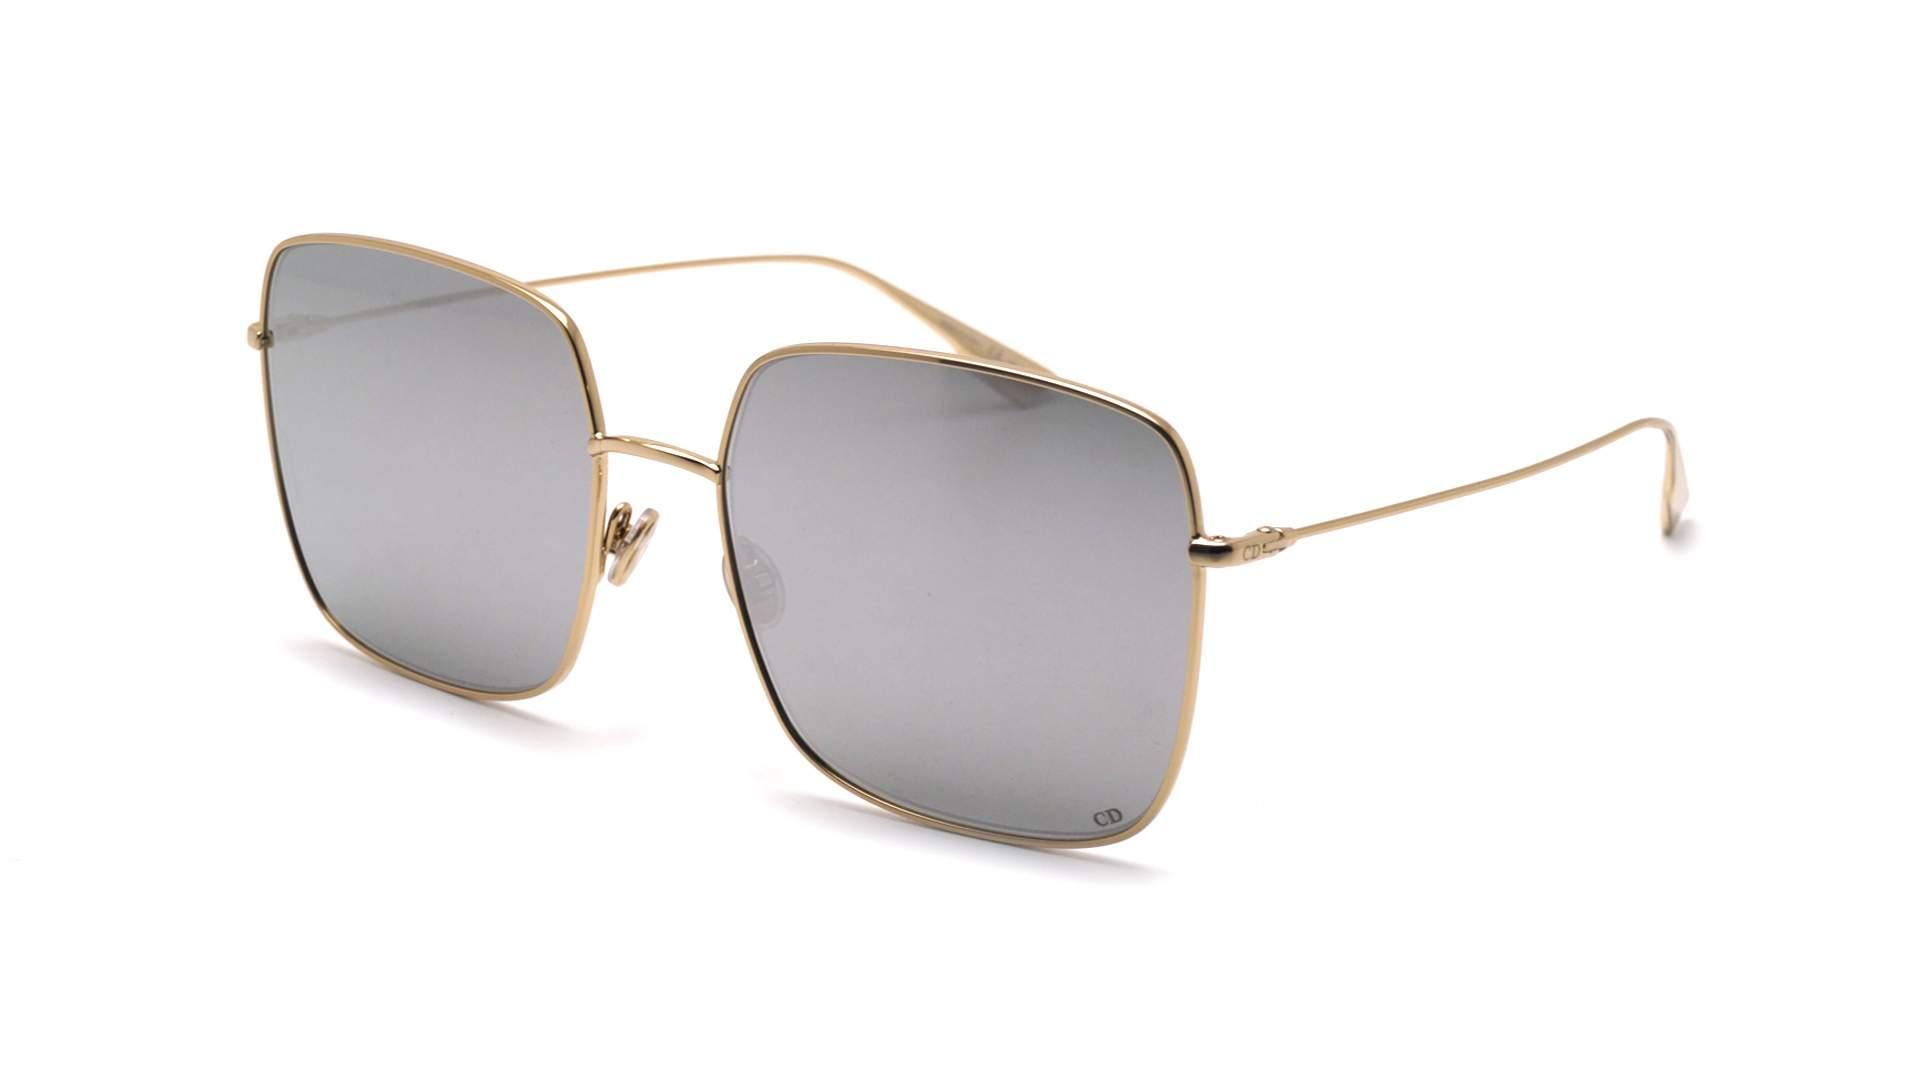 7982bace65 Sunglasses Dior Stellaire 1 Gold DIORSTELLAIRE1 83IOT 59-18 Medium Mirror